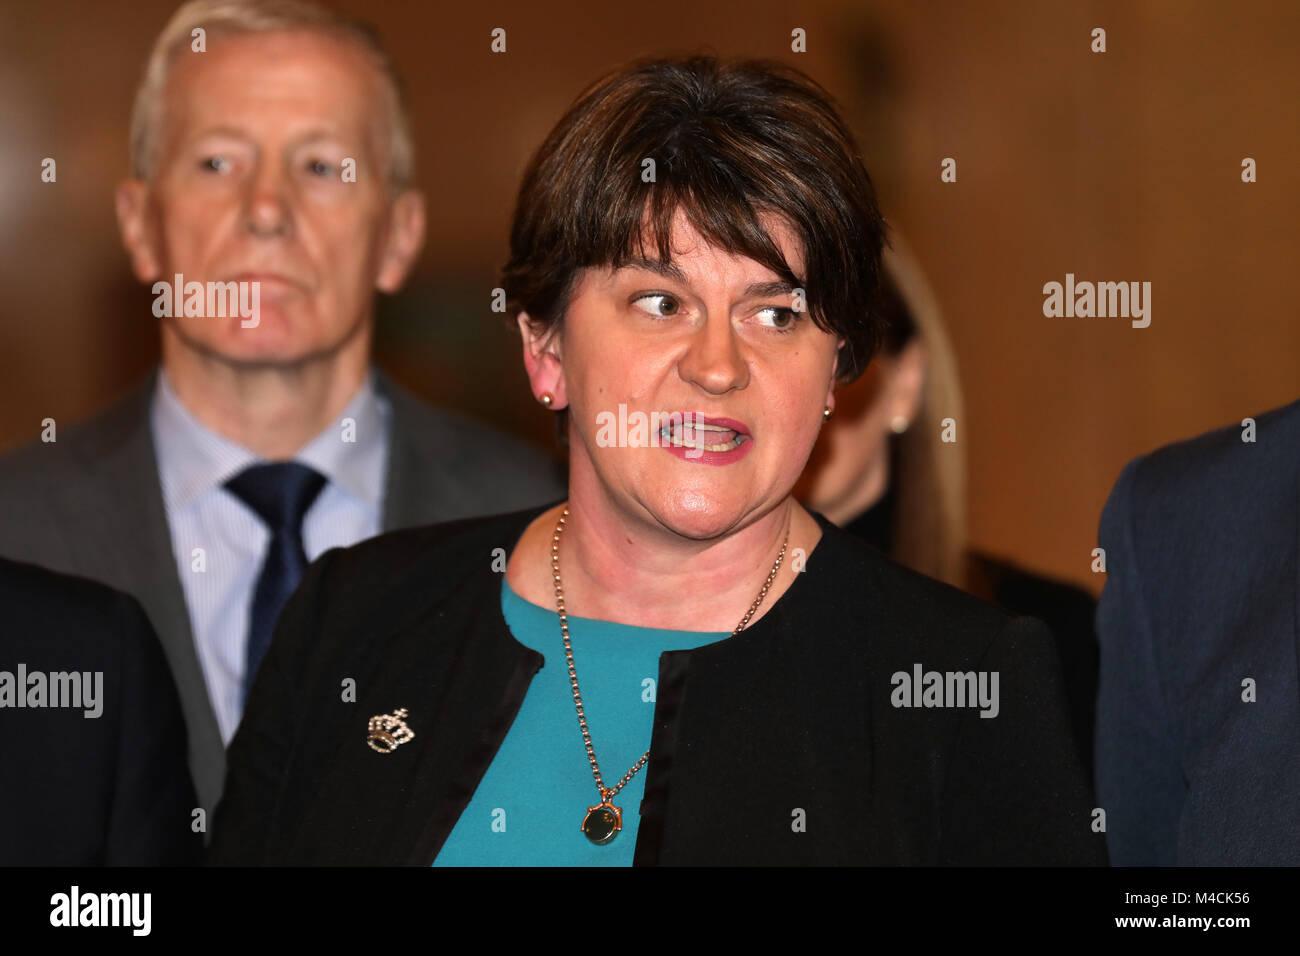 Northern Ireland Talks Failure Fallout - Stock Image